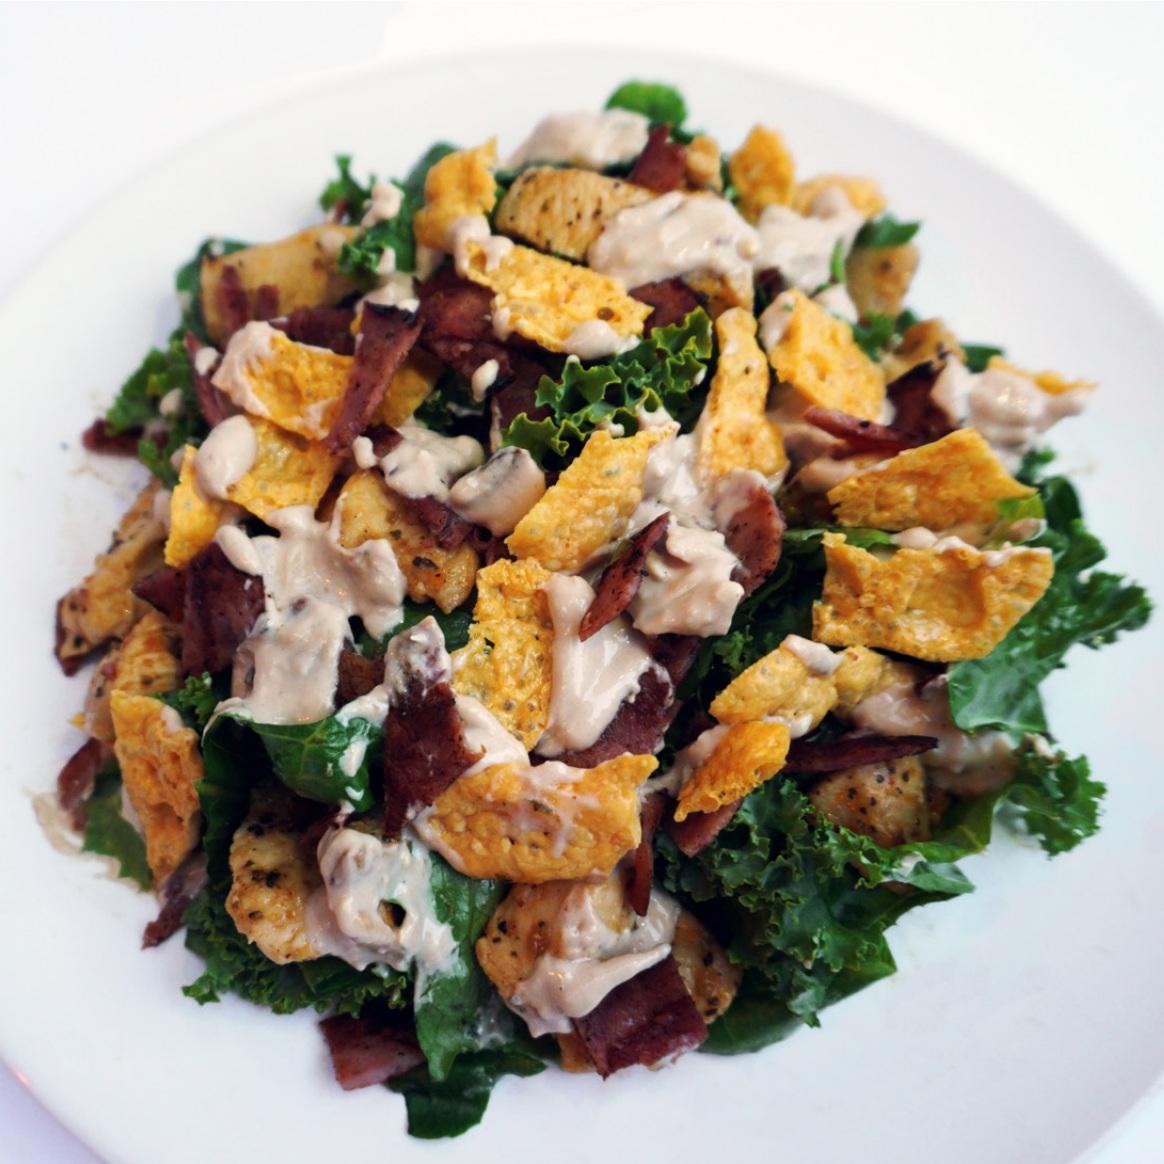 Salads, Sandwiches, & Bowls -